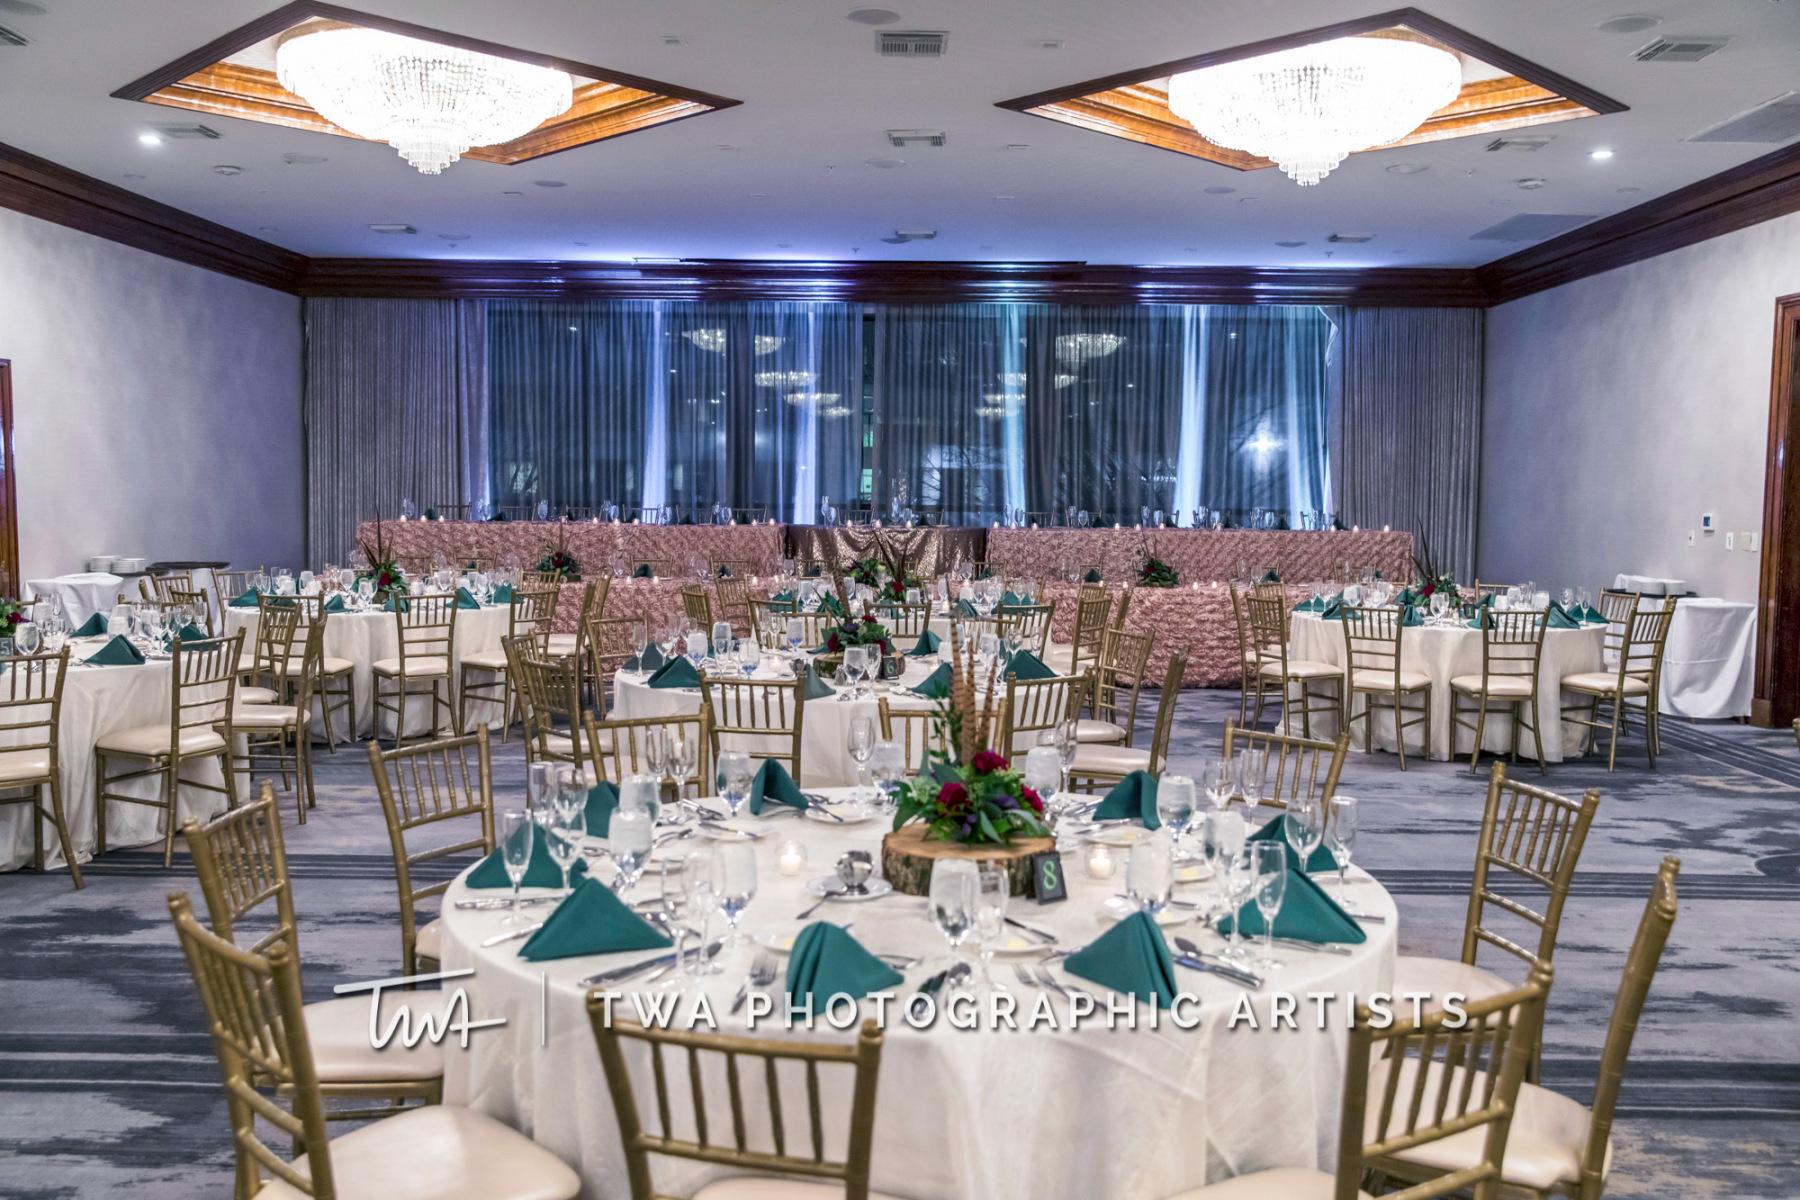 Chicago-Wedding-Photographer-TWA-Photographic-Artists-Drake-Hotel_Meyer_Mitchell_MC_DR-1266